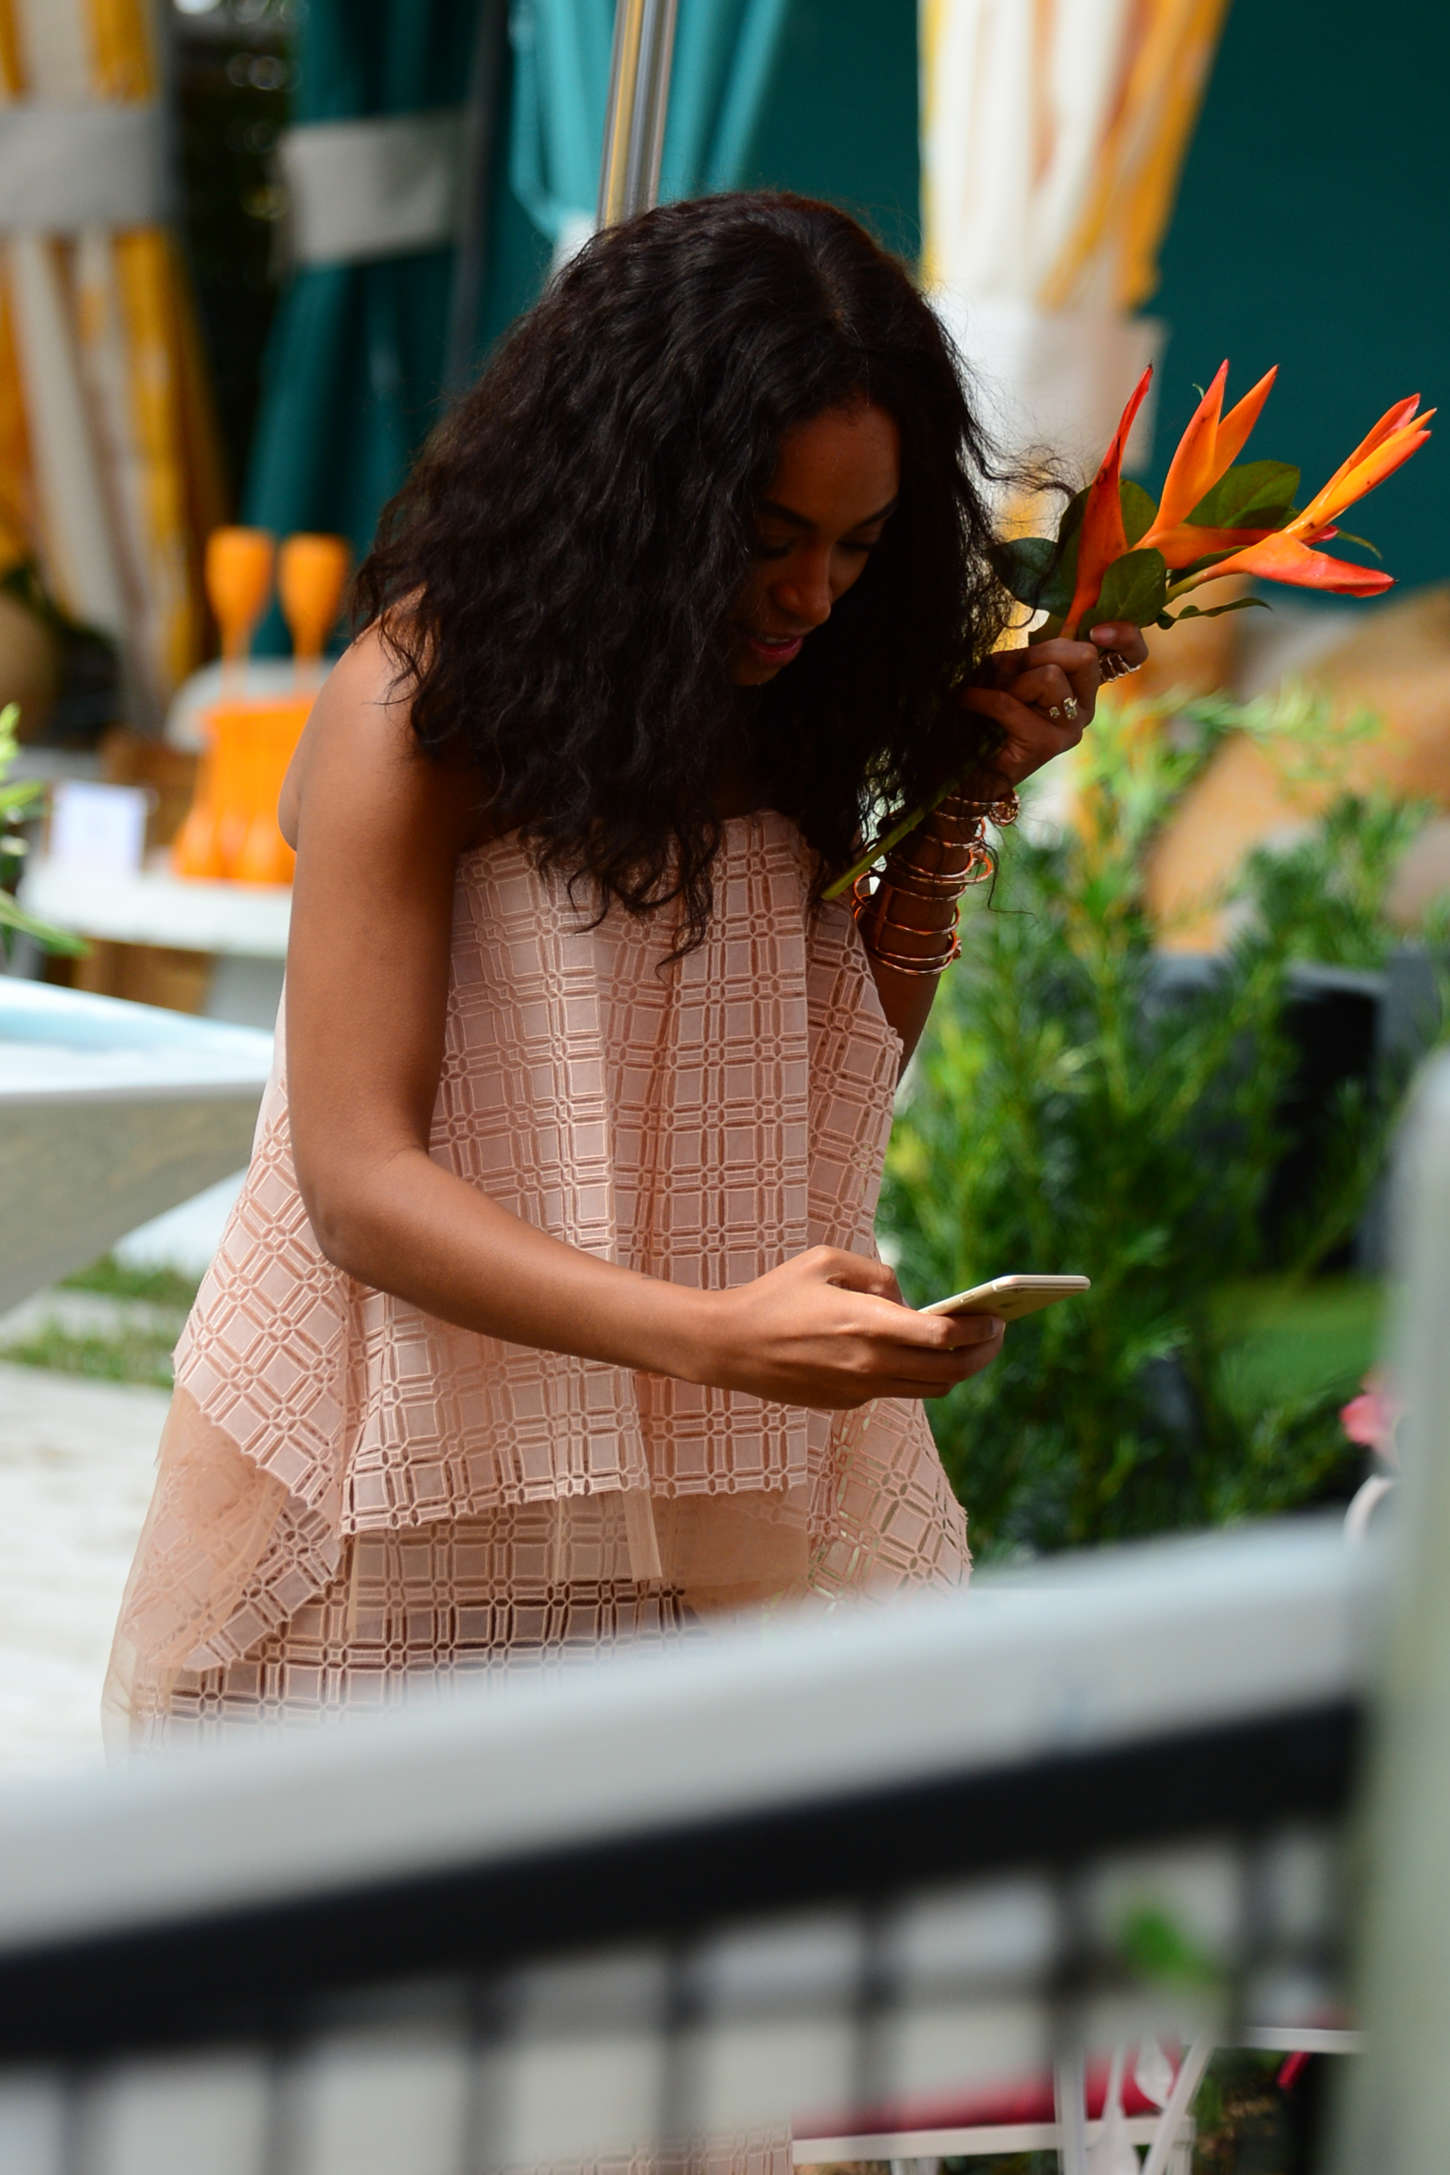 Solange Knowles Veuve Clicquot Carnaval Event in Miami